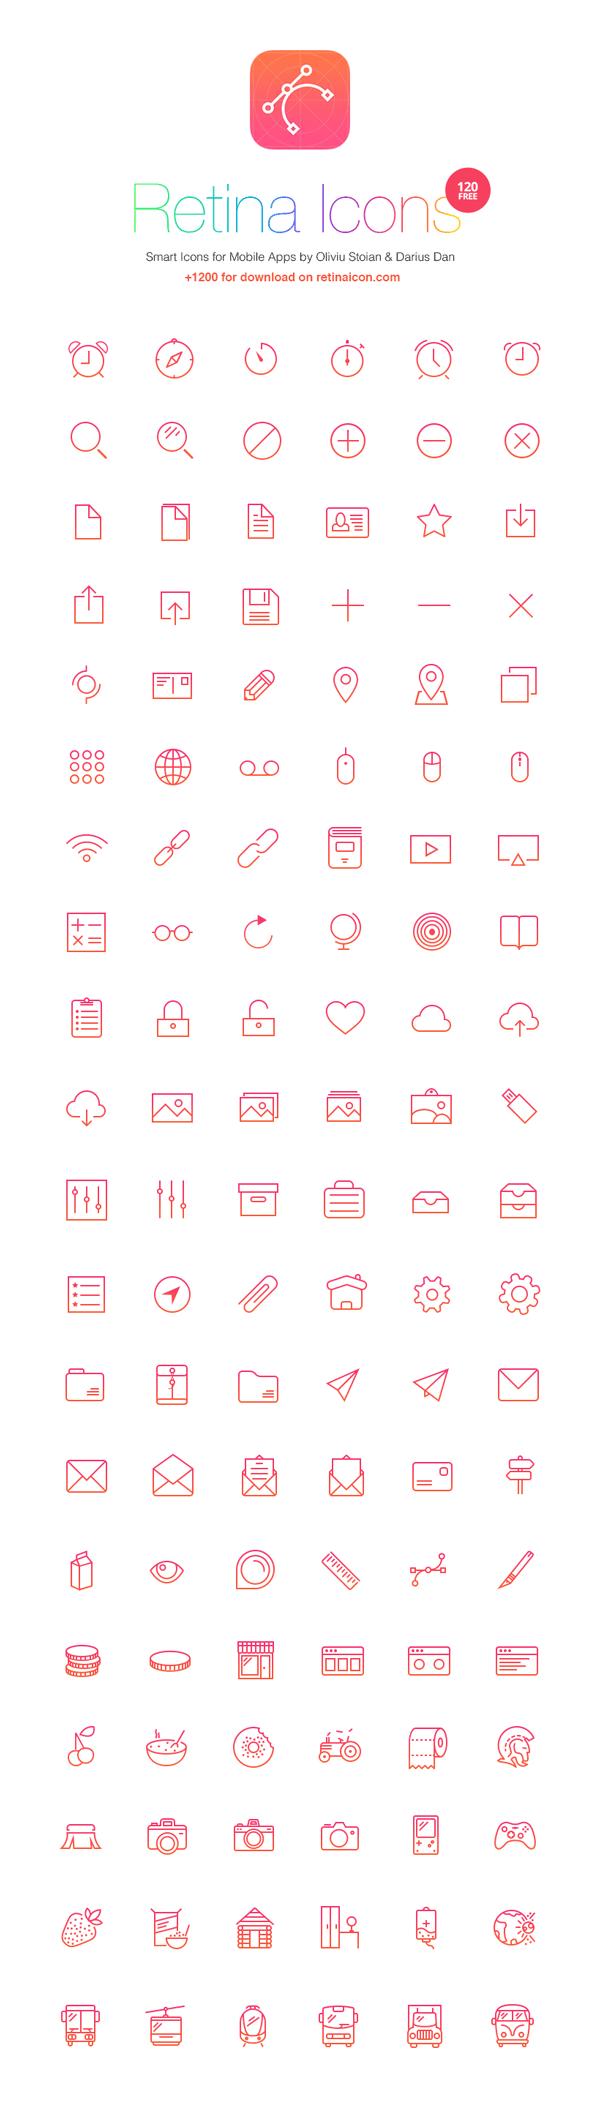 Iconos retina gratis